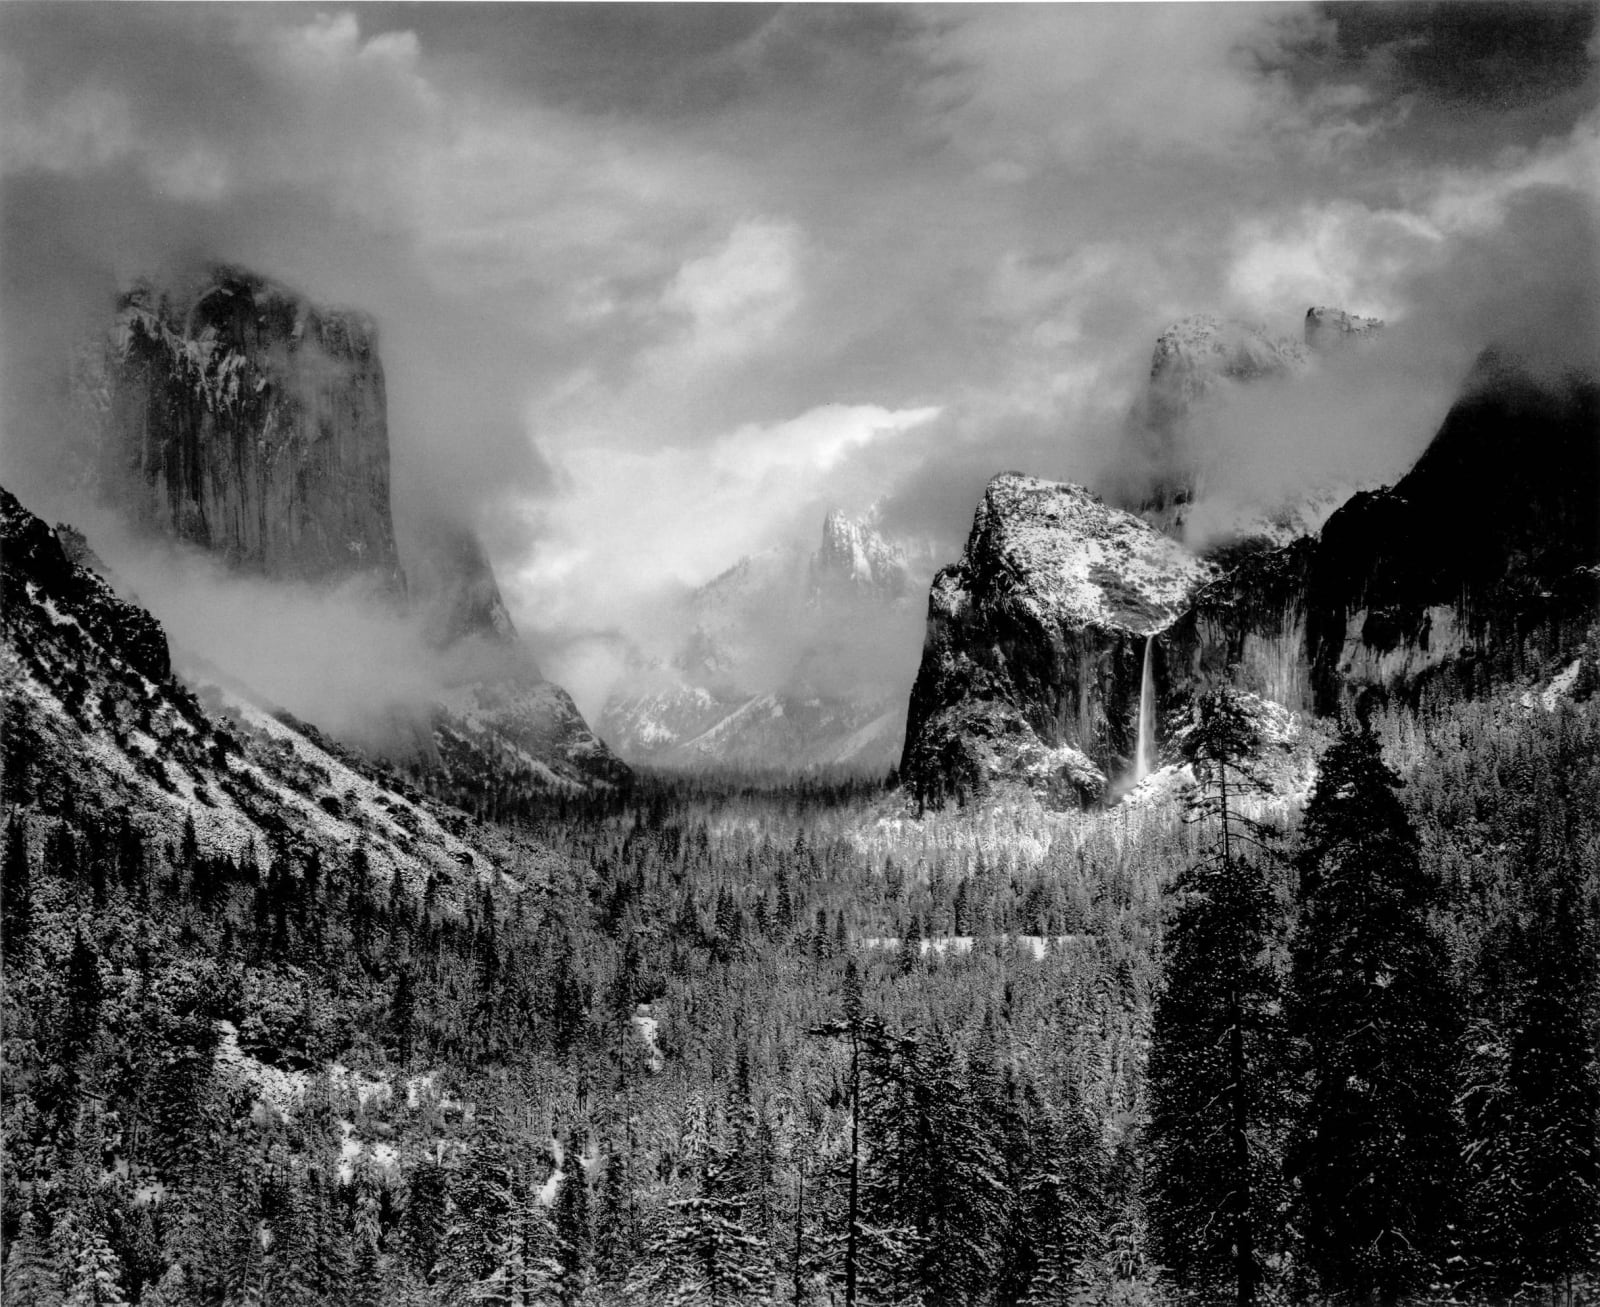 Ansel Adams, Clearing Winter Storm, Yosemite National Park, CA, 1944 (Printed 1970's)